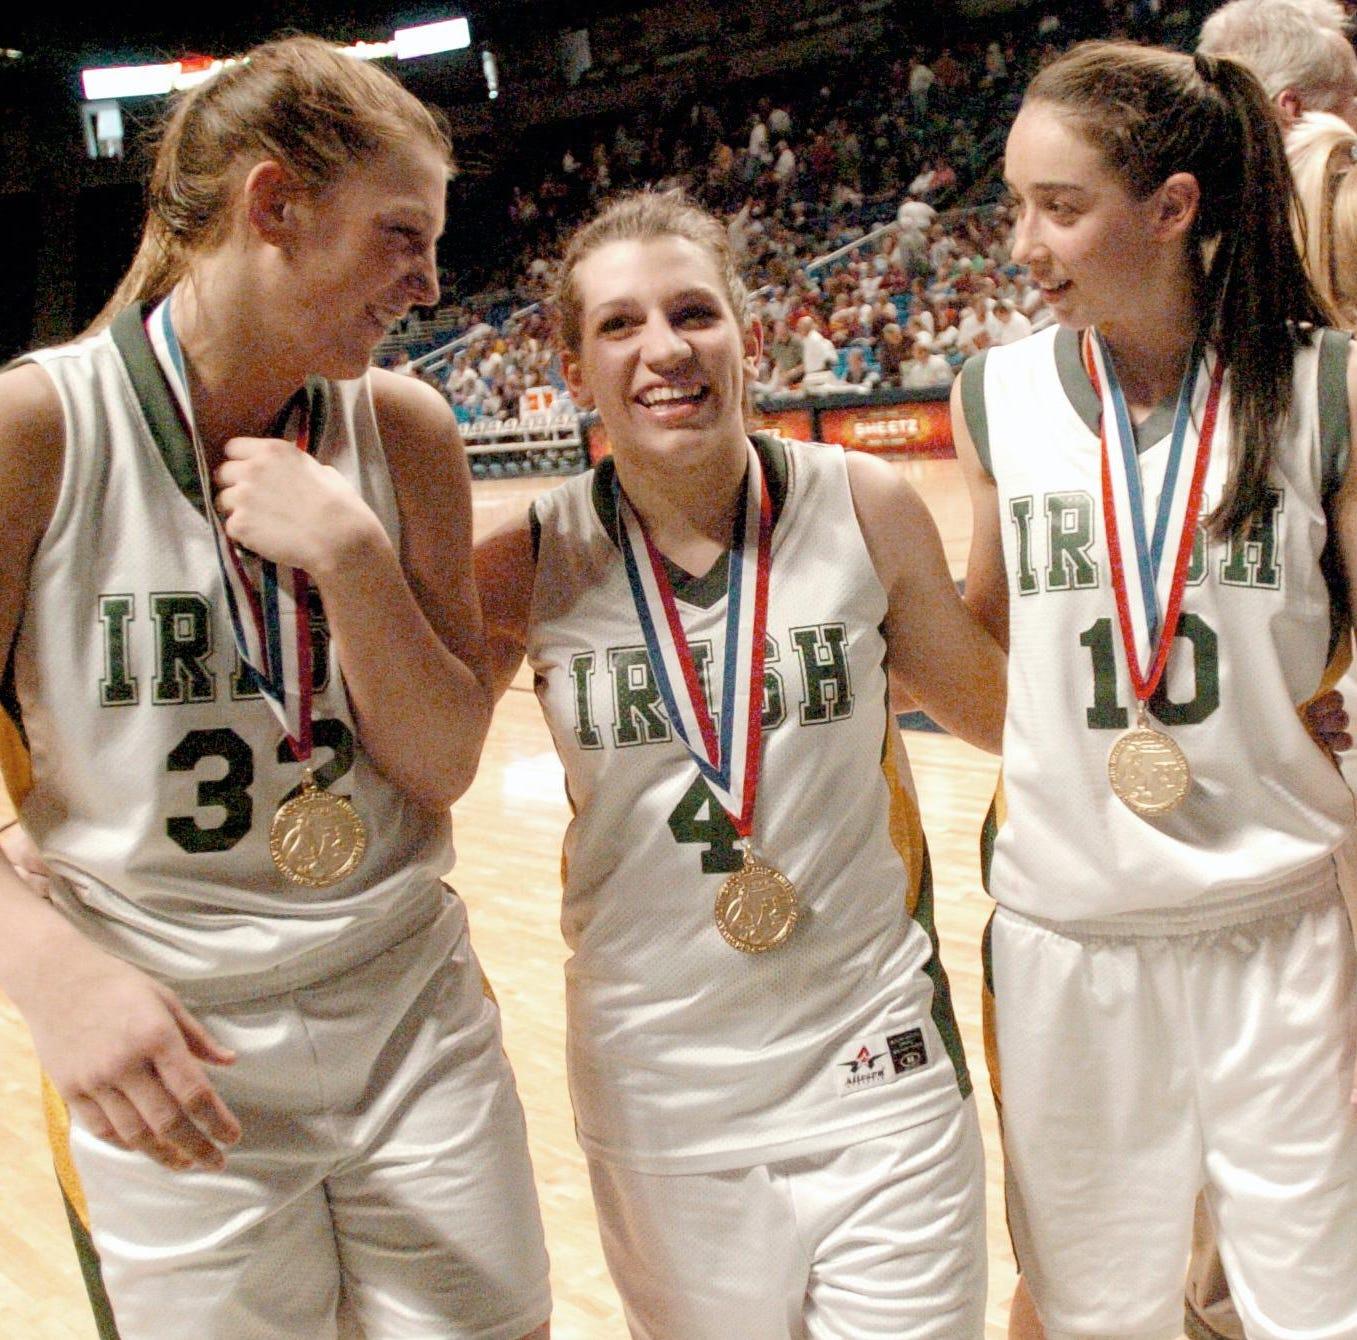 Lancaster Catholic girls set Pa. record, breaks mark previously held by York Catholic